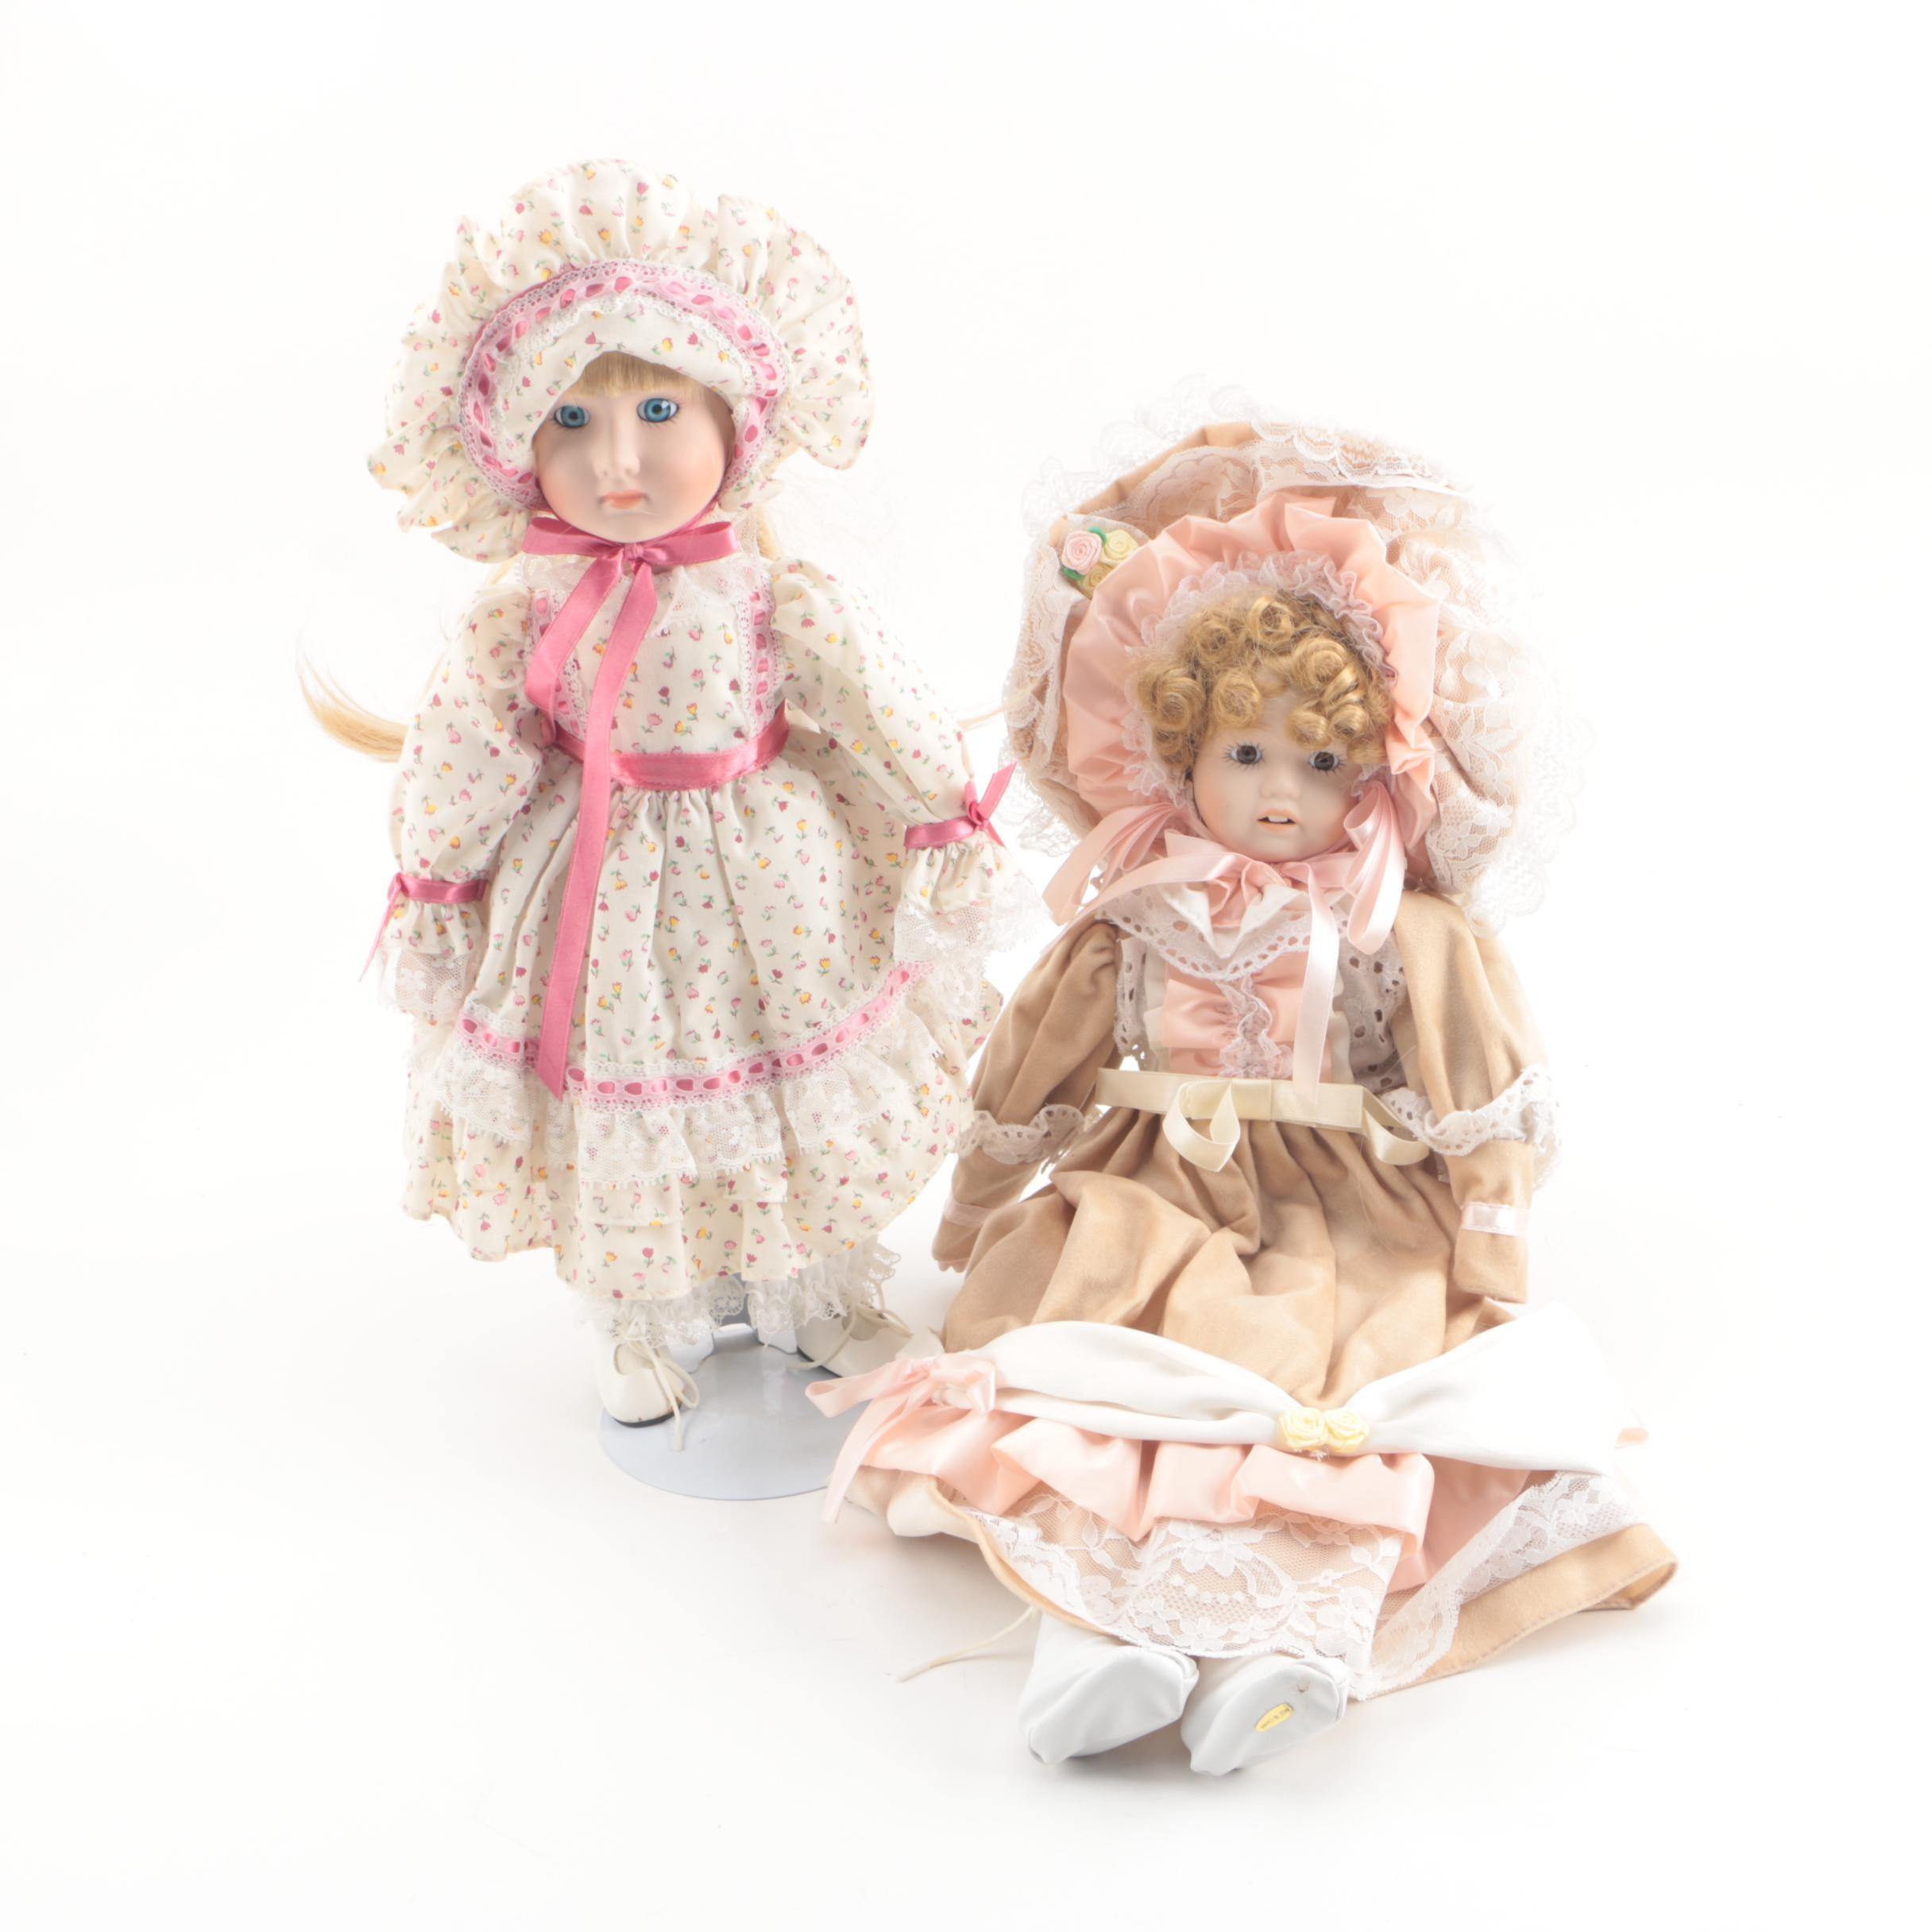 Vintage Hand-Painted Porcelain Dolls Featuring Enesco